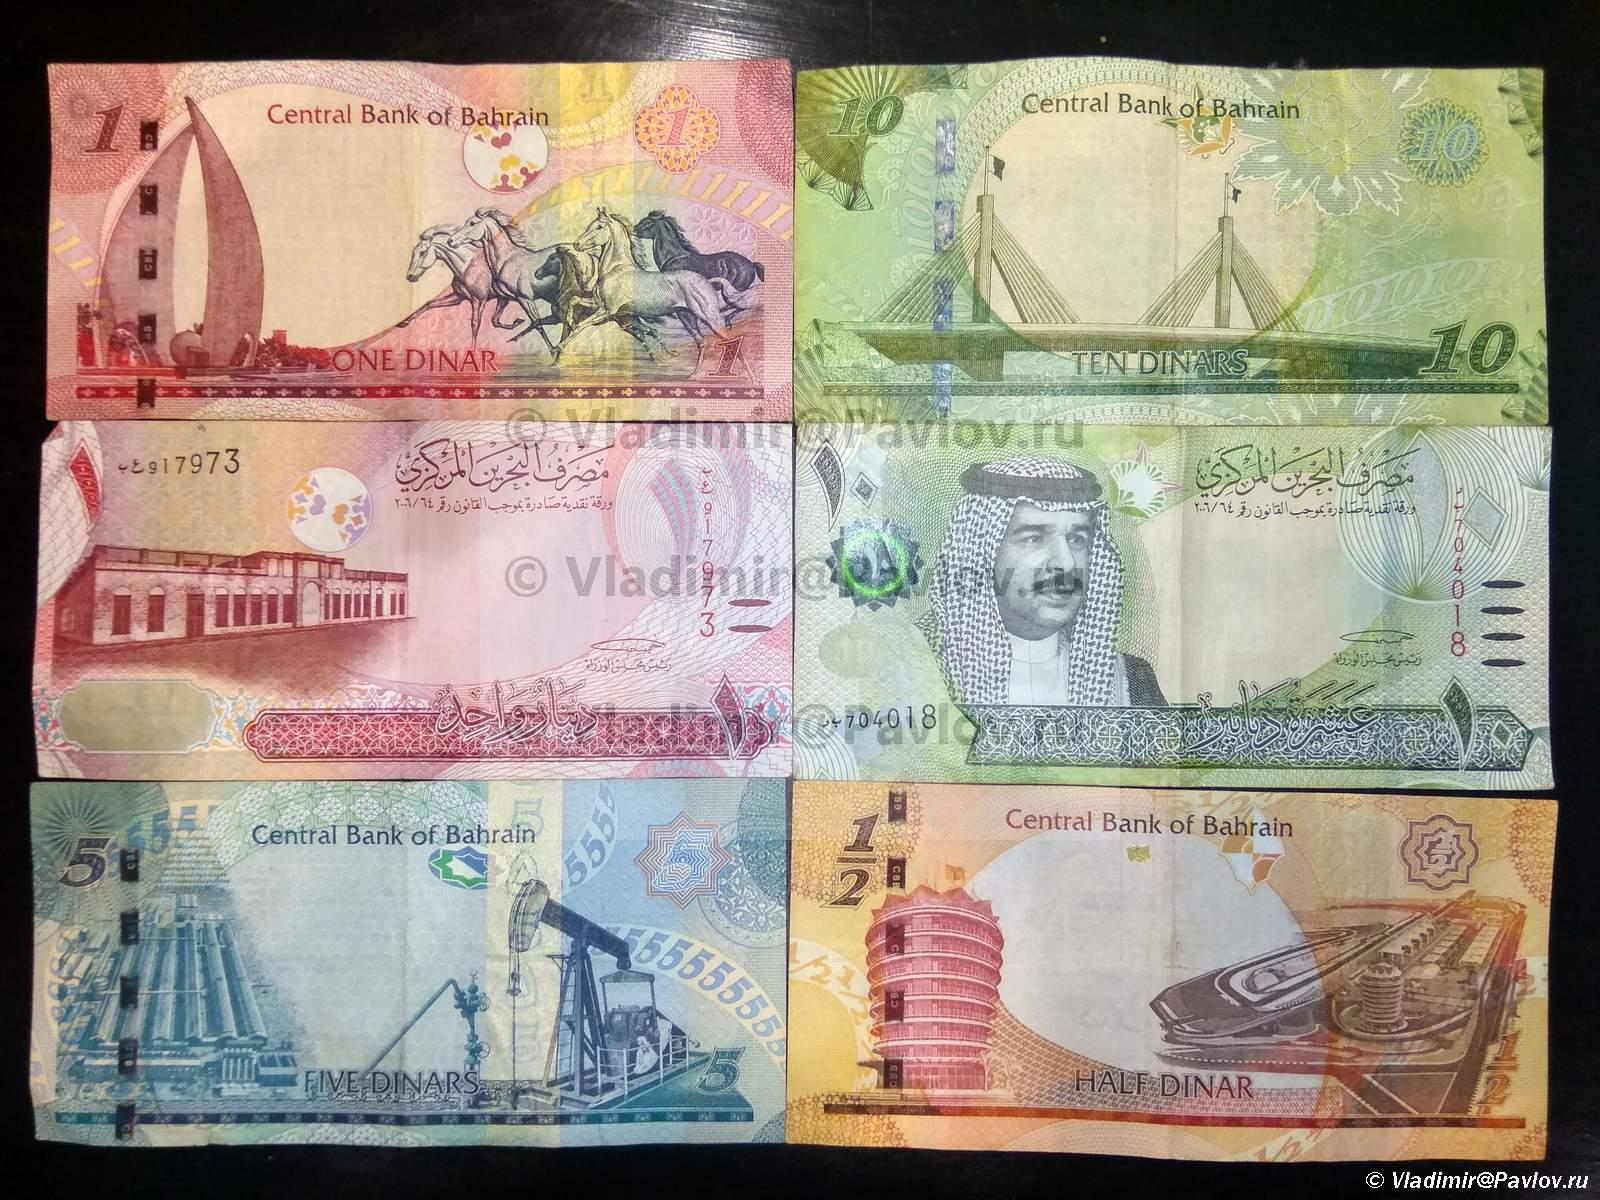 Valyuta Bahrejna bahrejnskie dinary BHD. Kurs dinara 26589 amerikanskih dollarov  - Полезная информация о Бахрейне для туристов